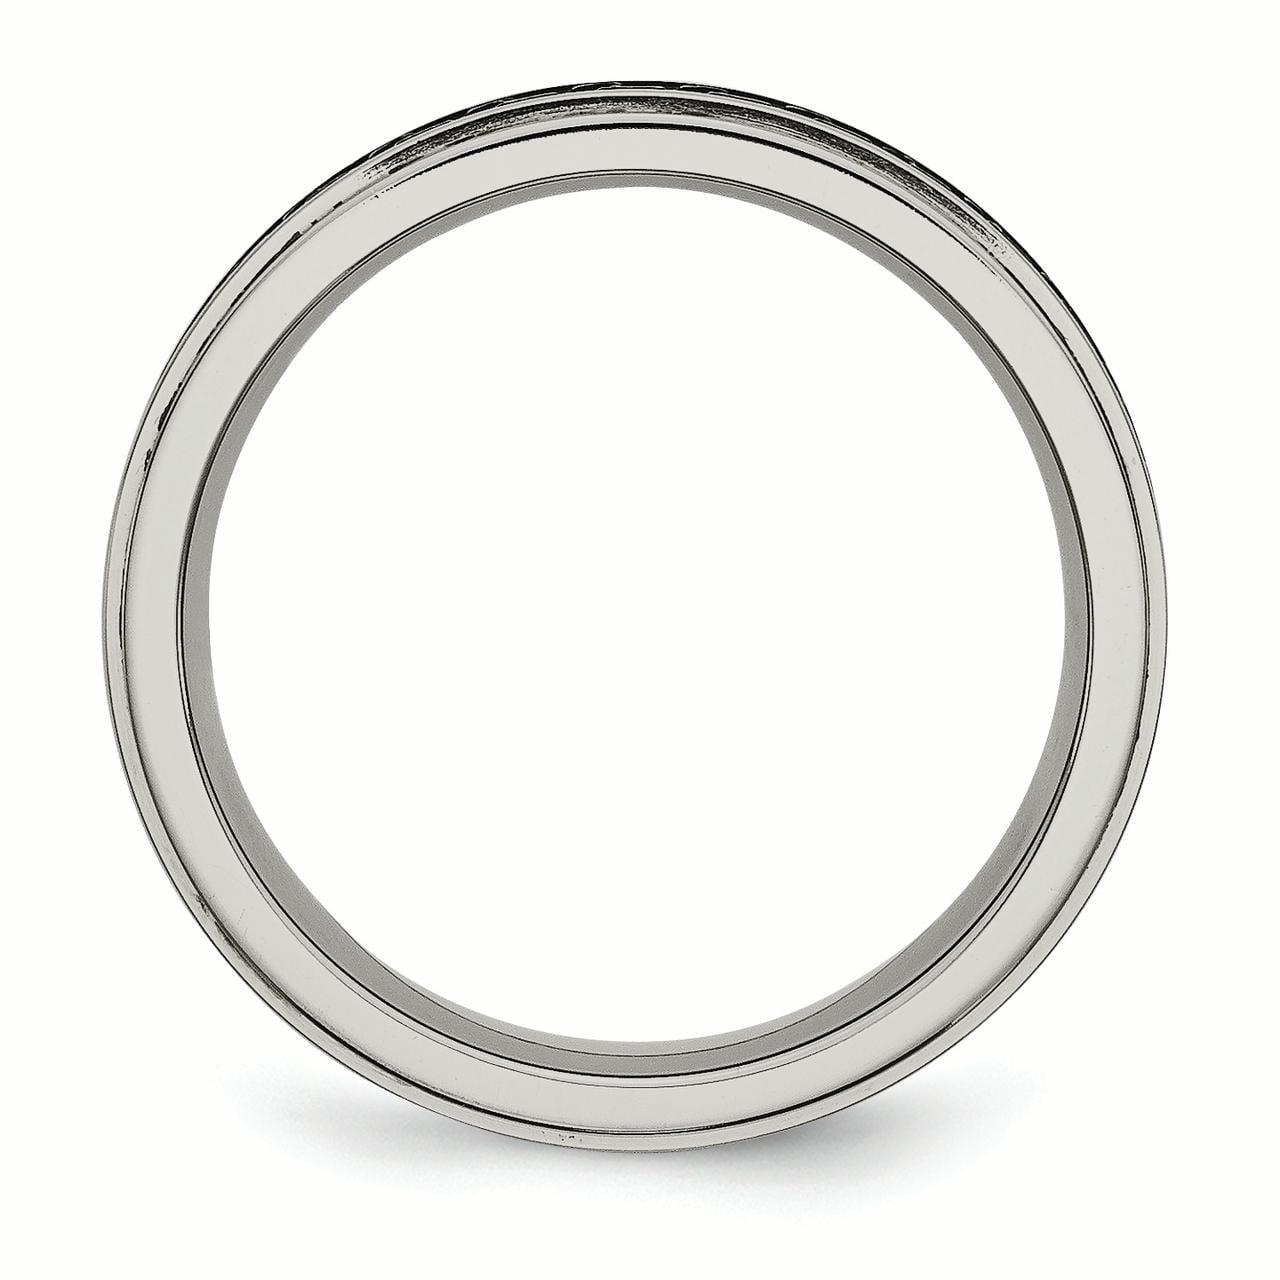 Engagement & Wedding Jewelry & Watches Titanium Ridged Edge Black Enamel Braid Design 6mm Wedding Ring Band Size 11.00